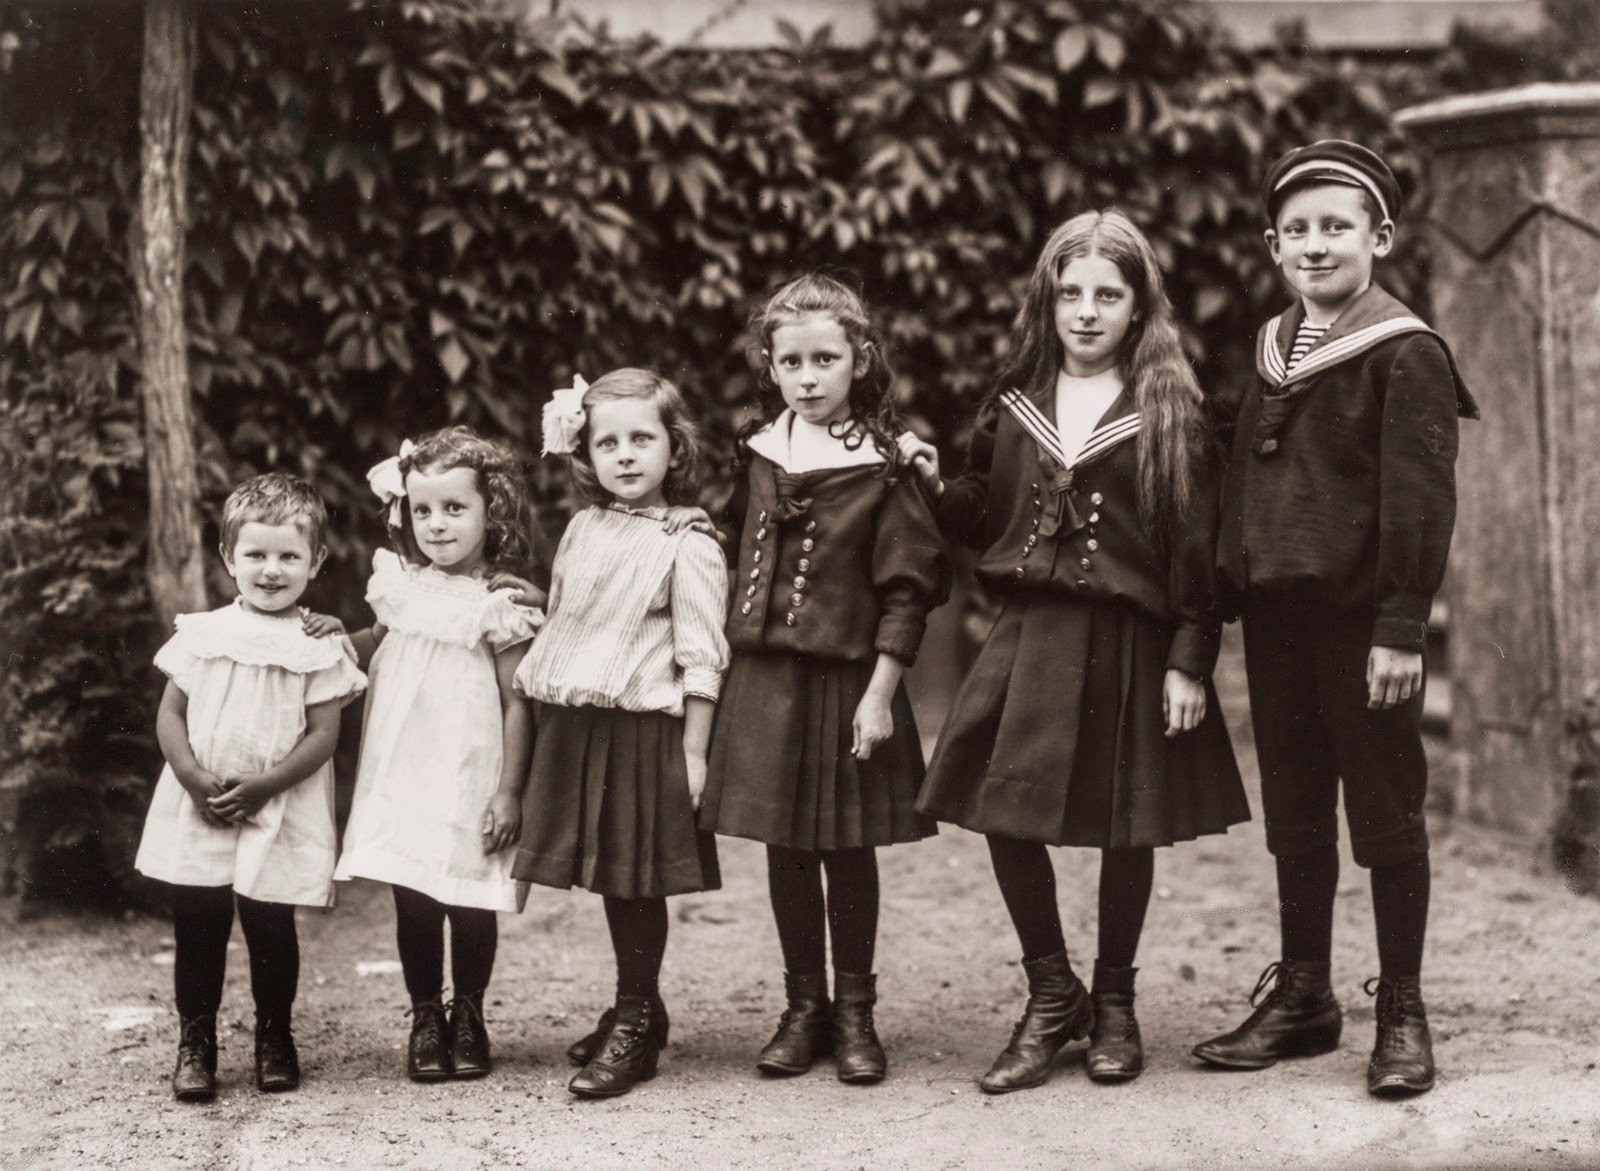 August Sander: Dzieci właściciela majątku ziemskiego, 1911–1914 © Die Photographische Sammlung/SK Stiftung Kultur – August Sander Archiv, Köln; VG Bild-Kunst, Bonn, 2017 (źródło: materiały prasowe organizatora)